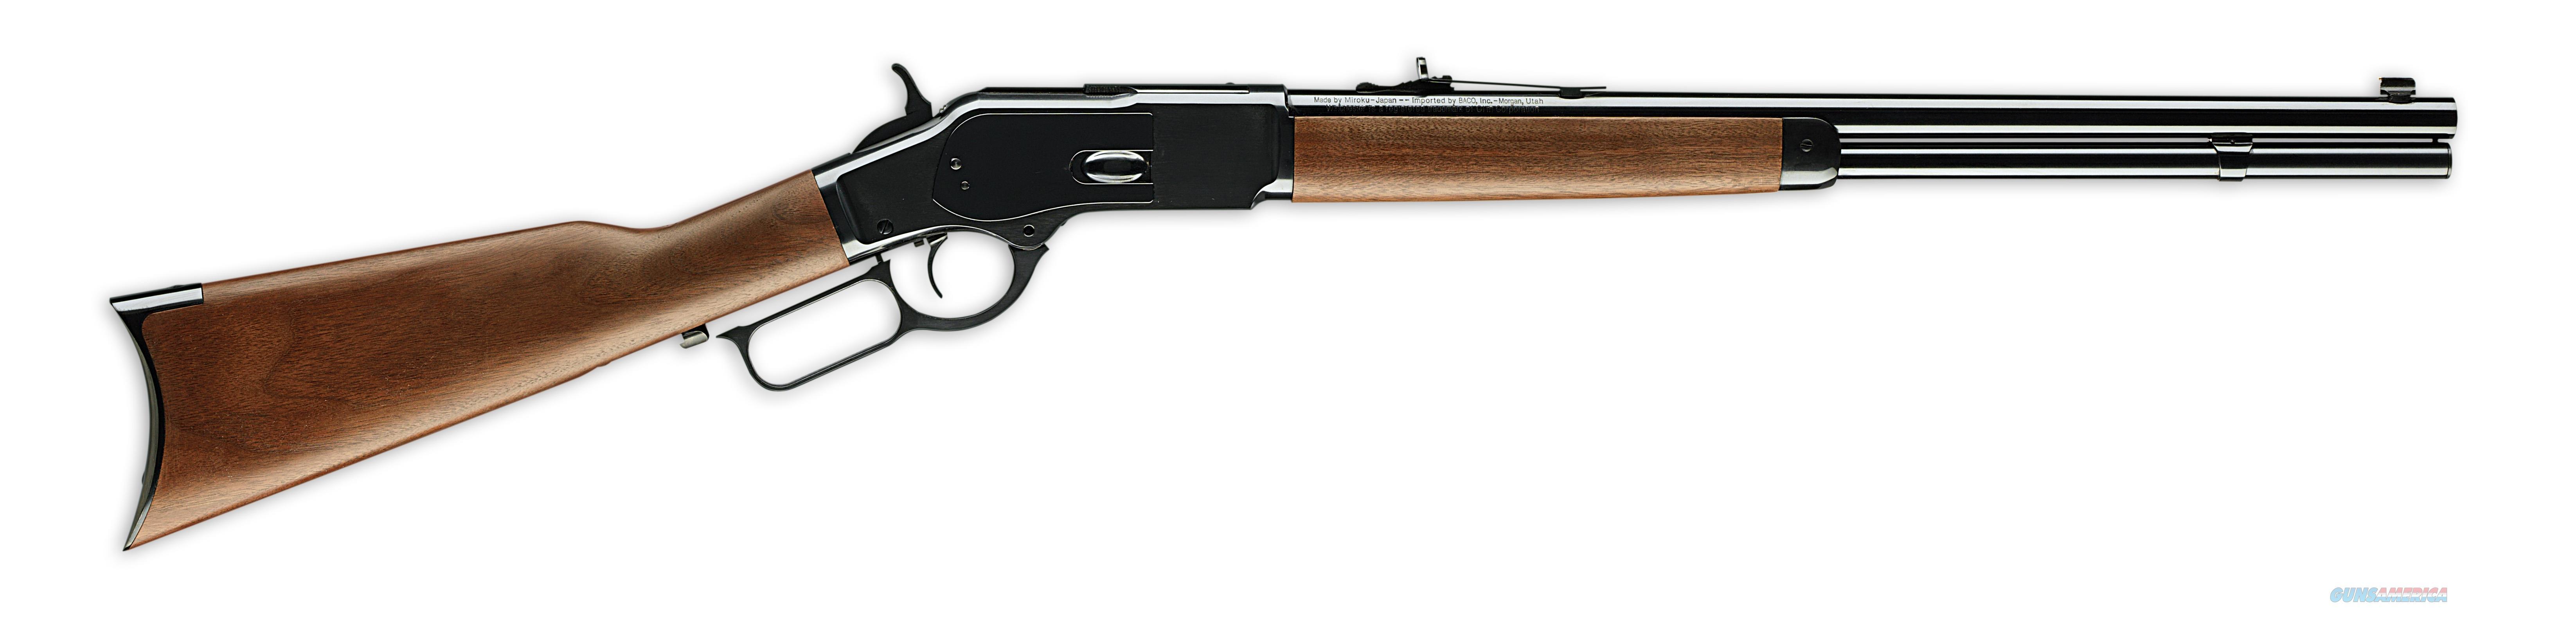 Winchester Model 1873 Short Rifle .44-40 Win Walnut 534200140   Guns > Rifles > Winchester Replica Rifle Misc.